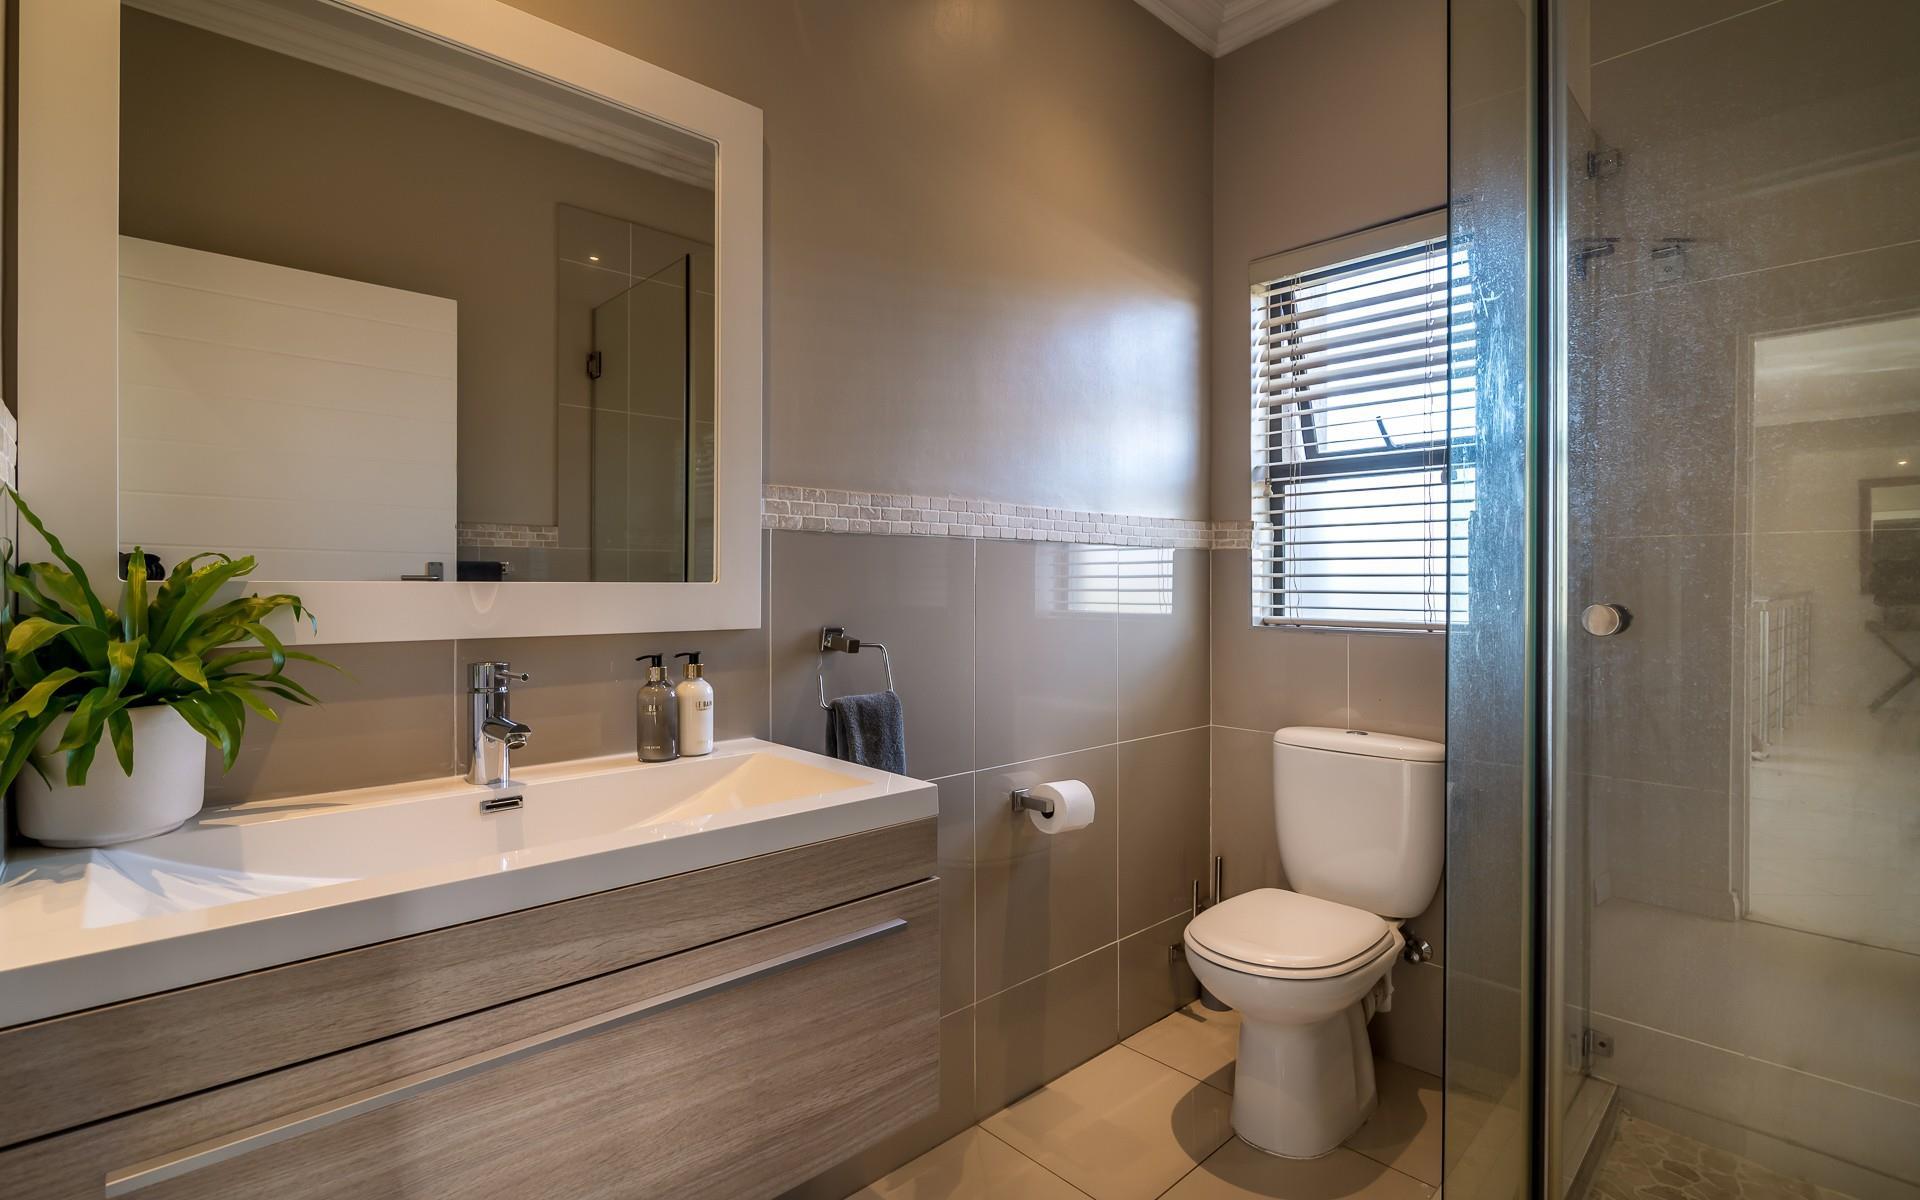 4 Bedroom House For Sale in Broadacres